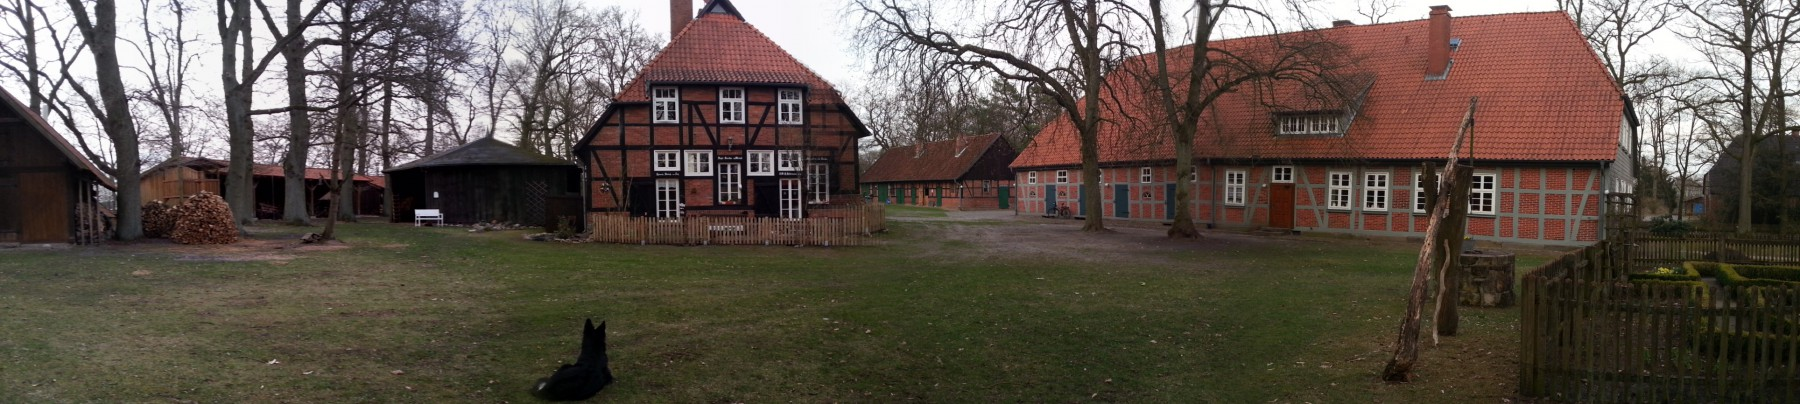 Heimatverein Peetshof Wietzendorf e.V.